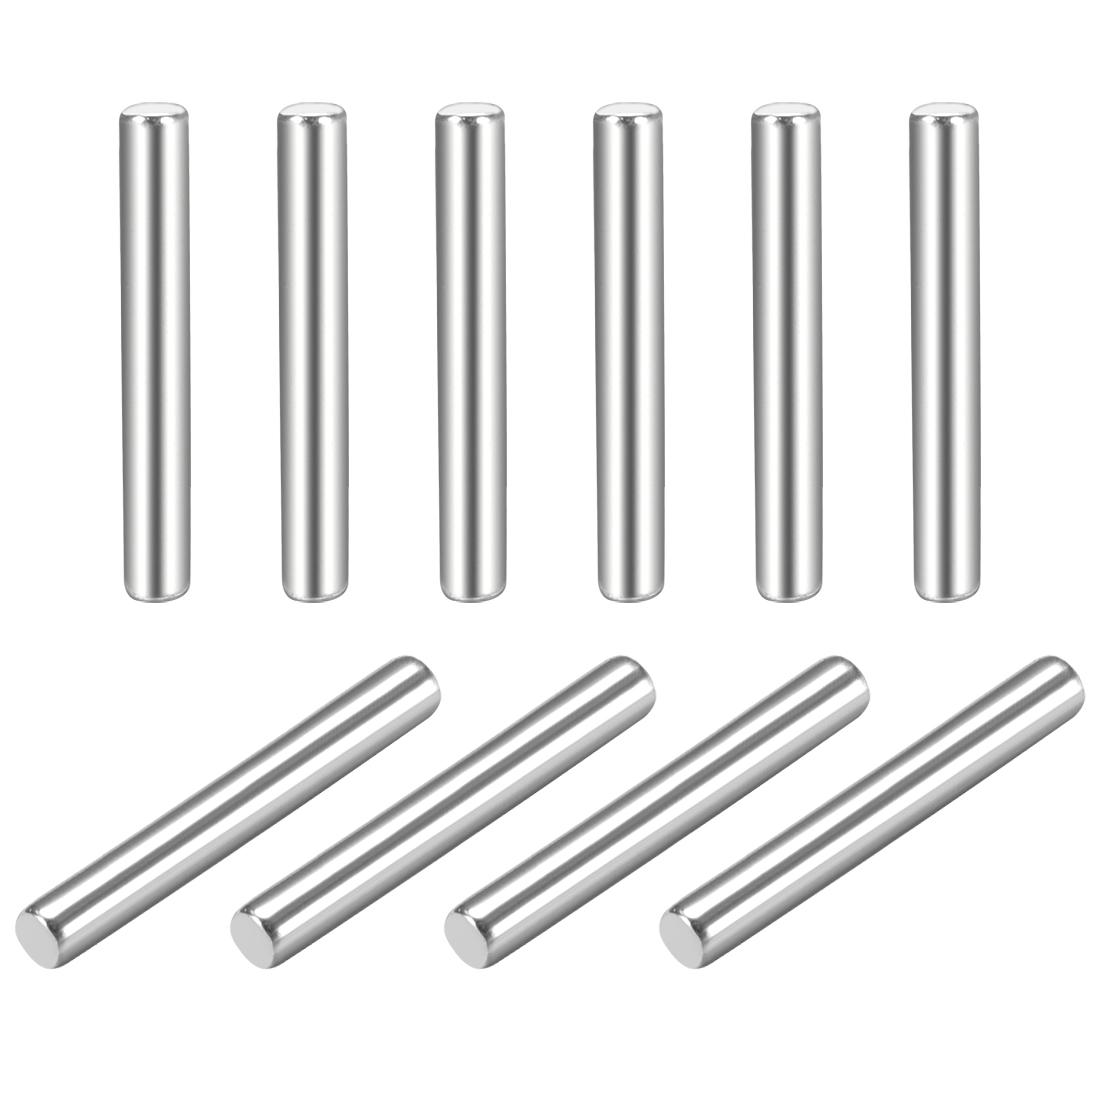 10Pcs 1.5mm x 12mm Dowel Pin 304 Stainless Steel Shelf Support Pin Fasten